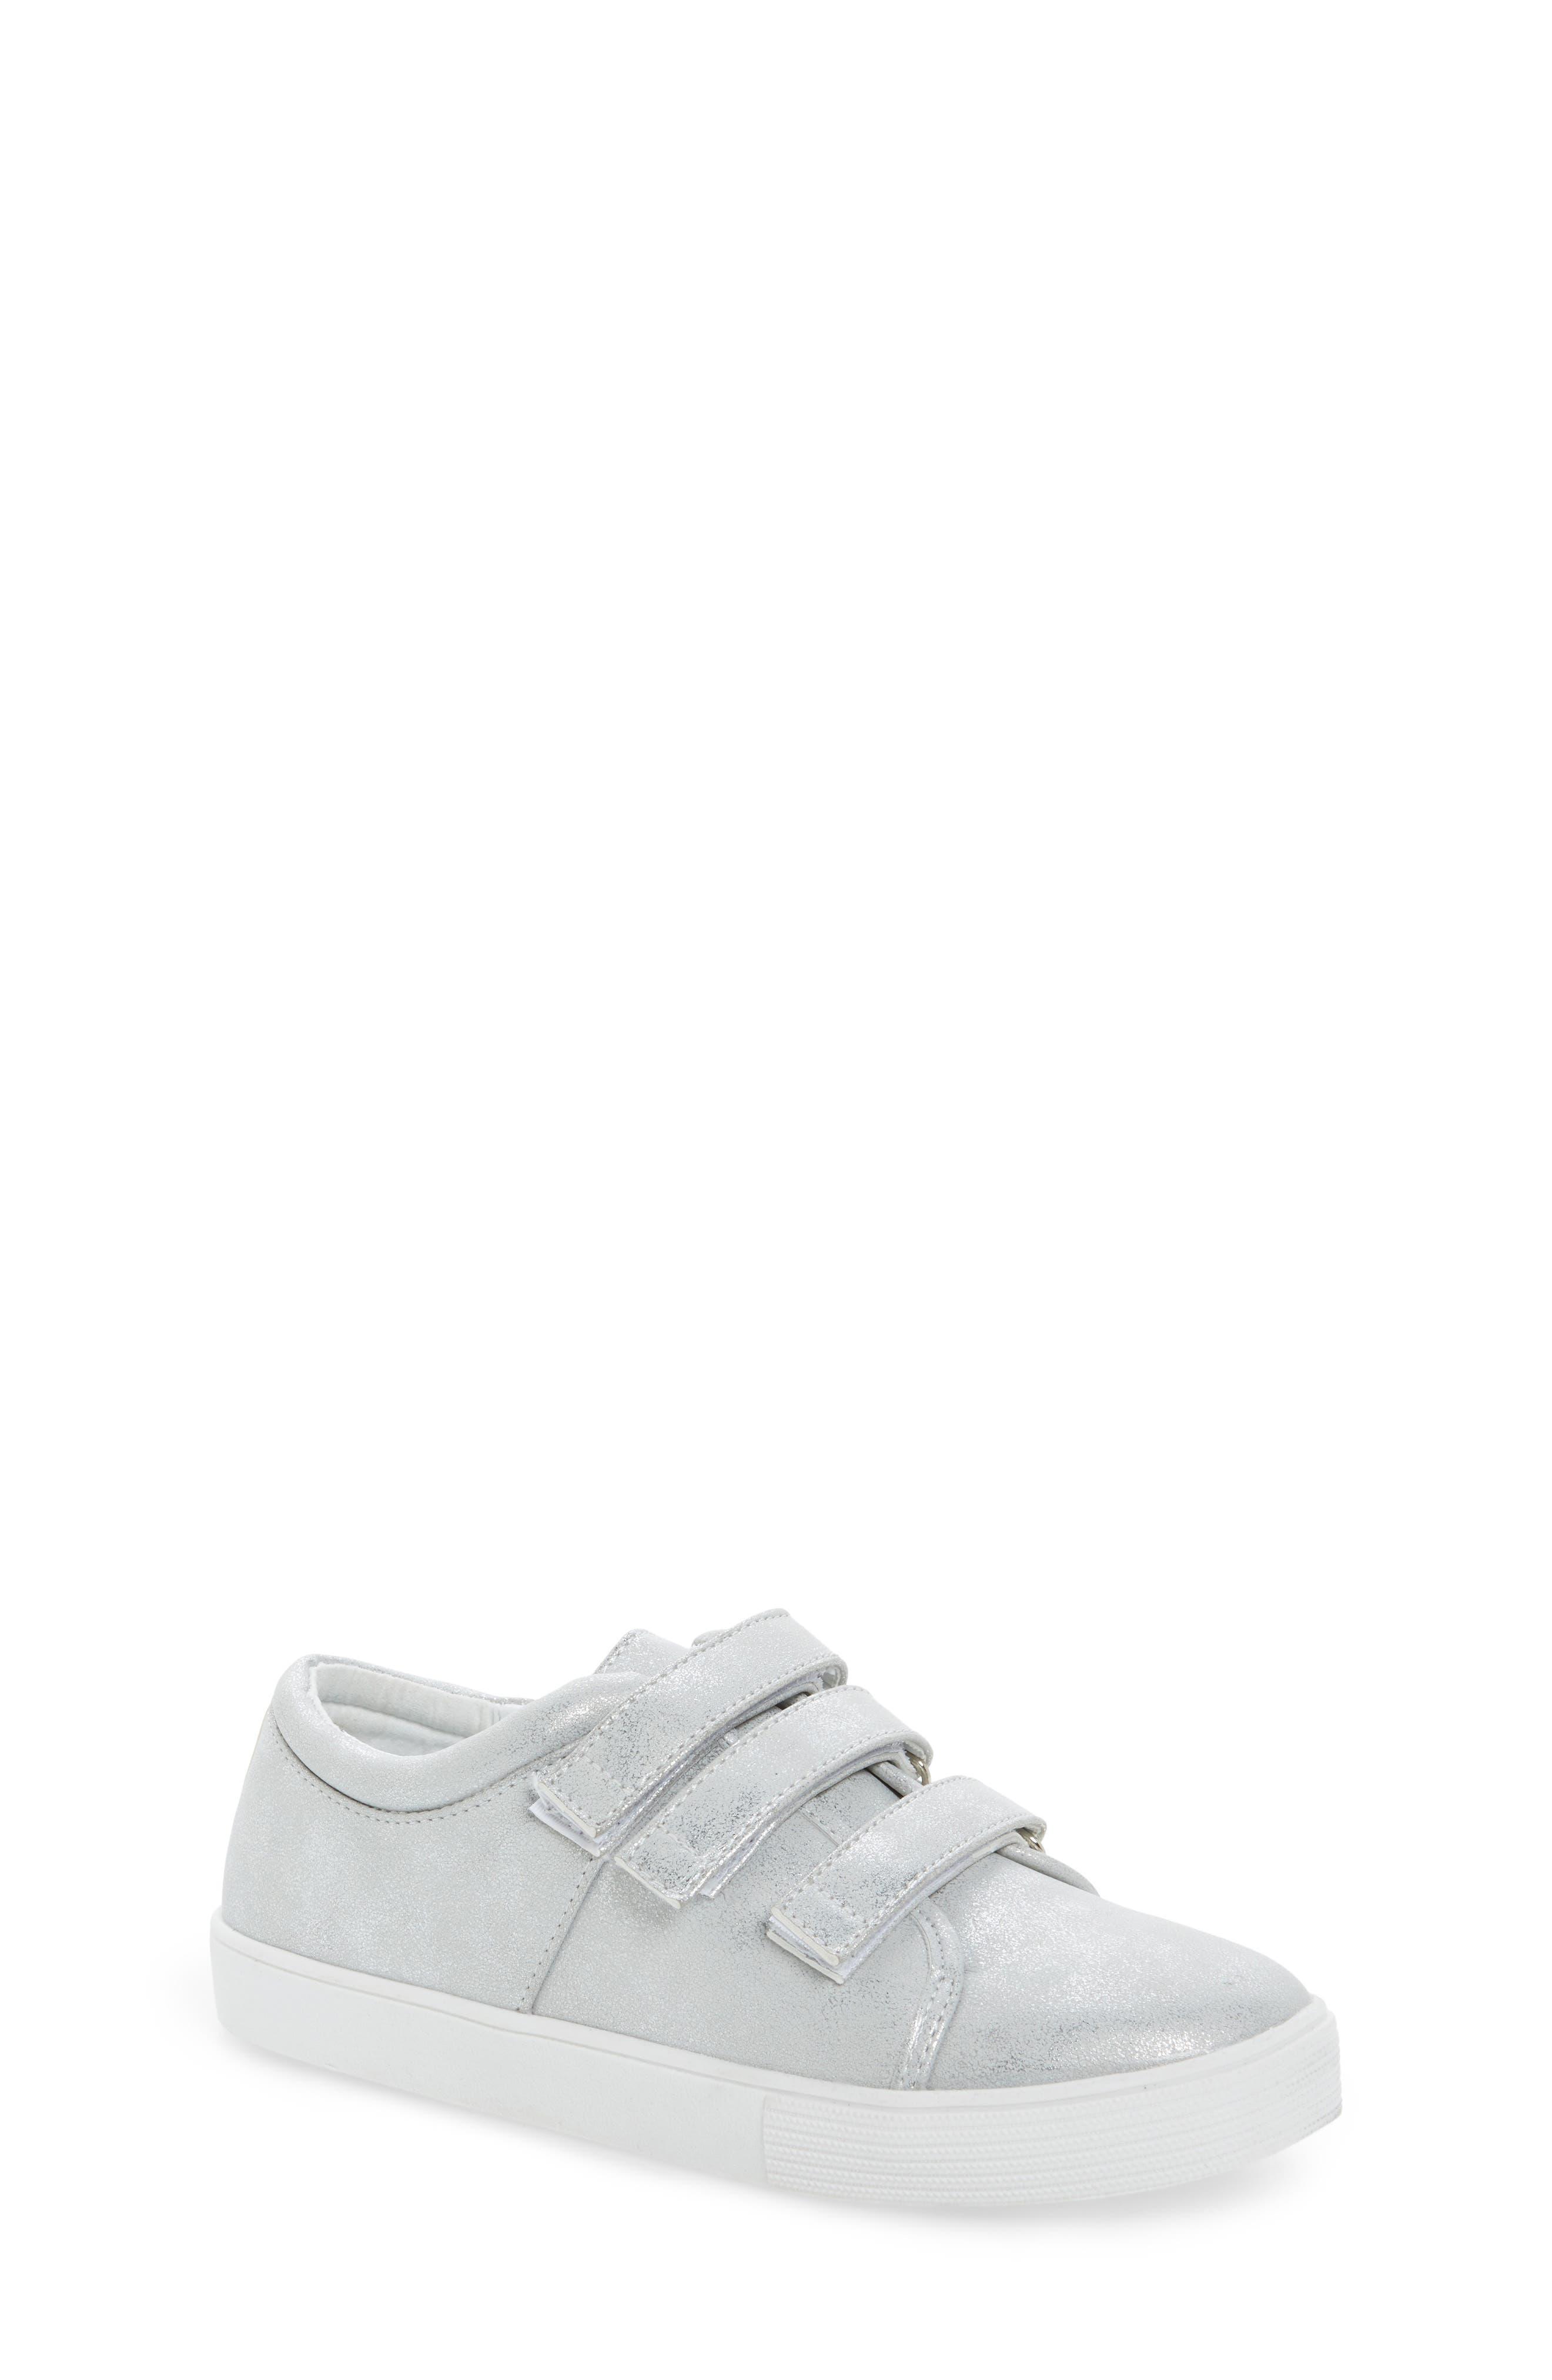 Alternate Image 1 Selected - Kenneth Cole New York Kam Glitter Strap Sneaker (Toddler, Little Kid & Big Kid)